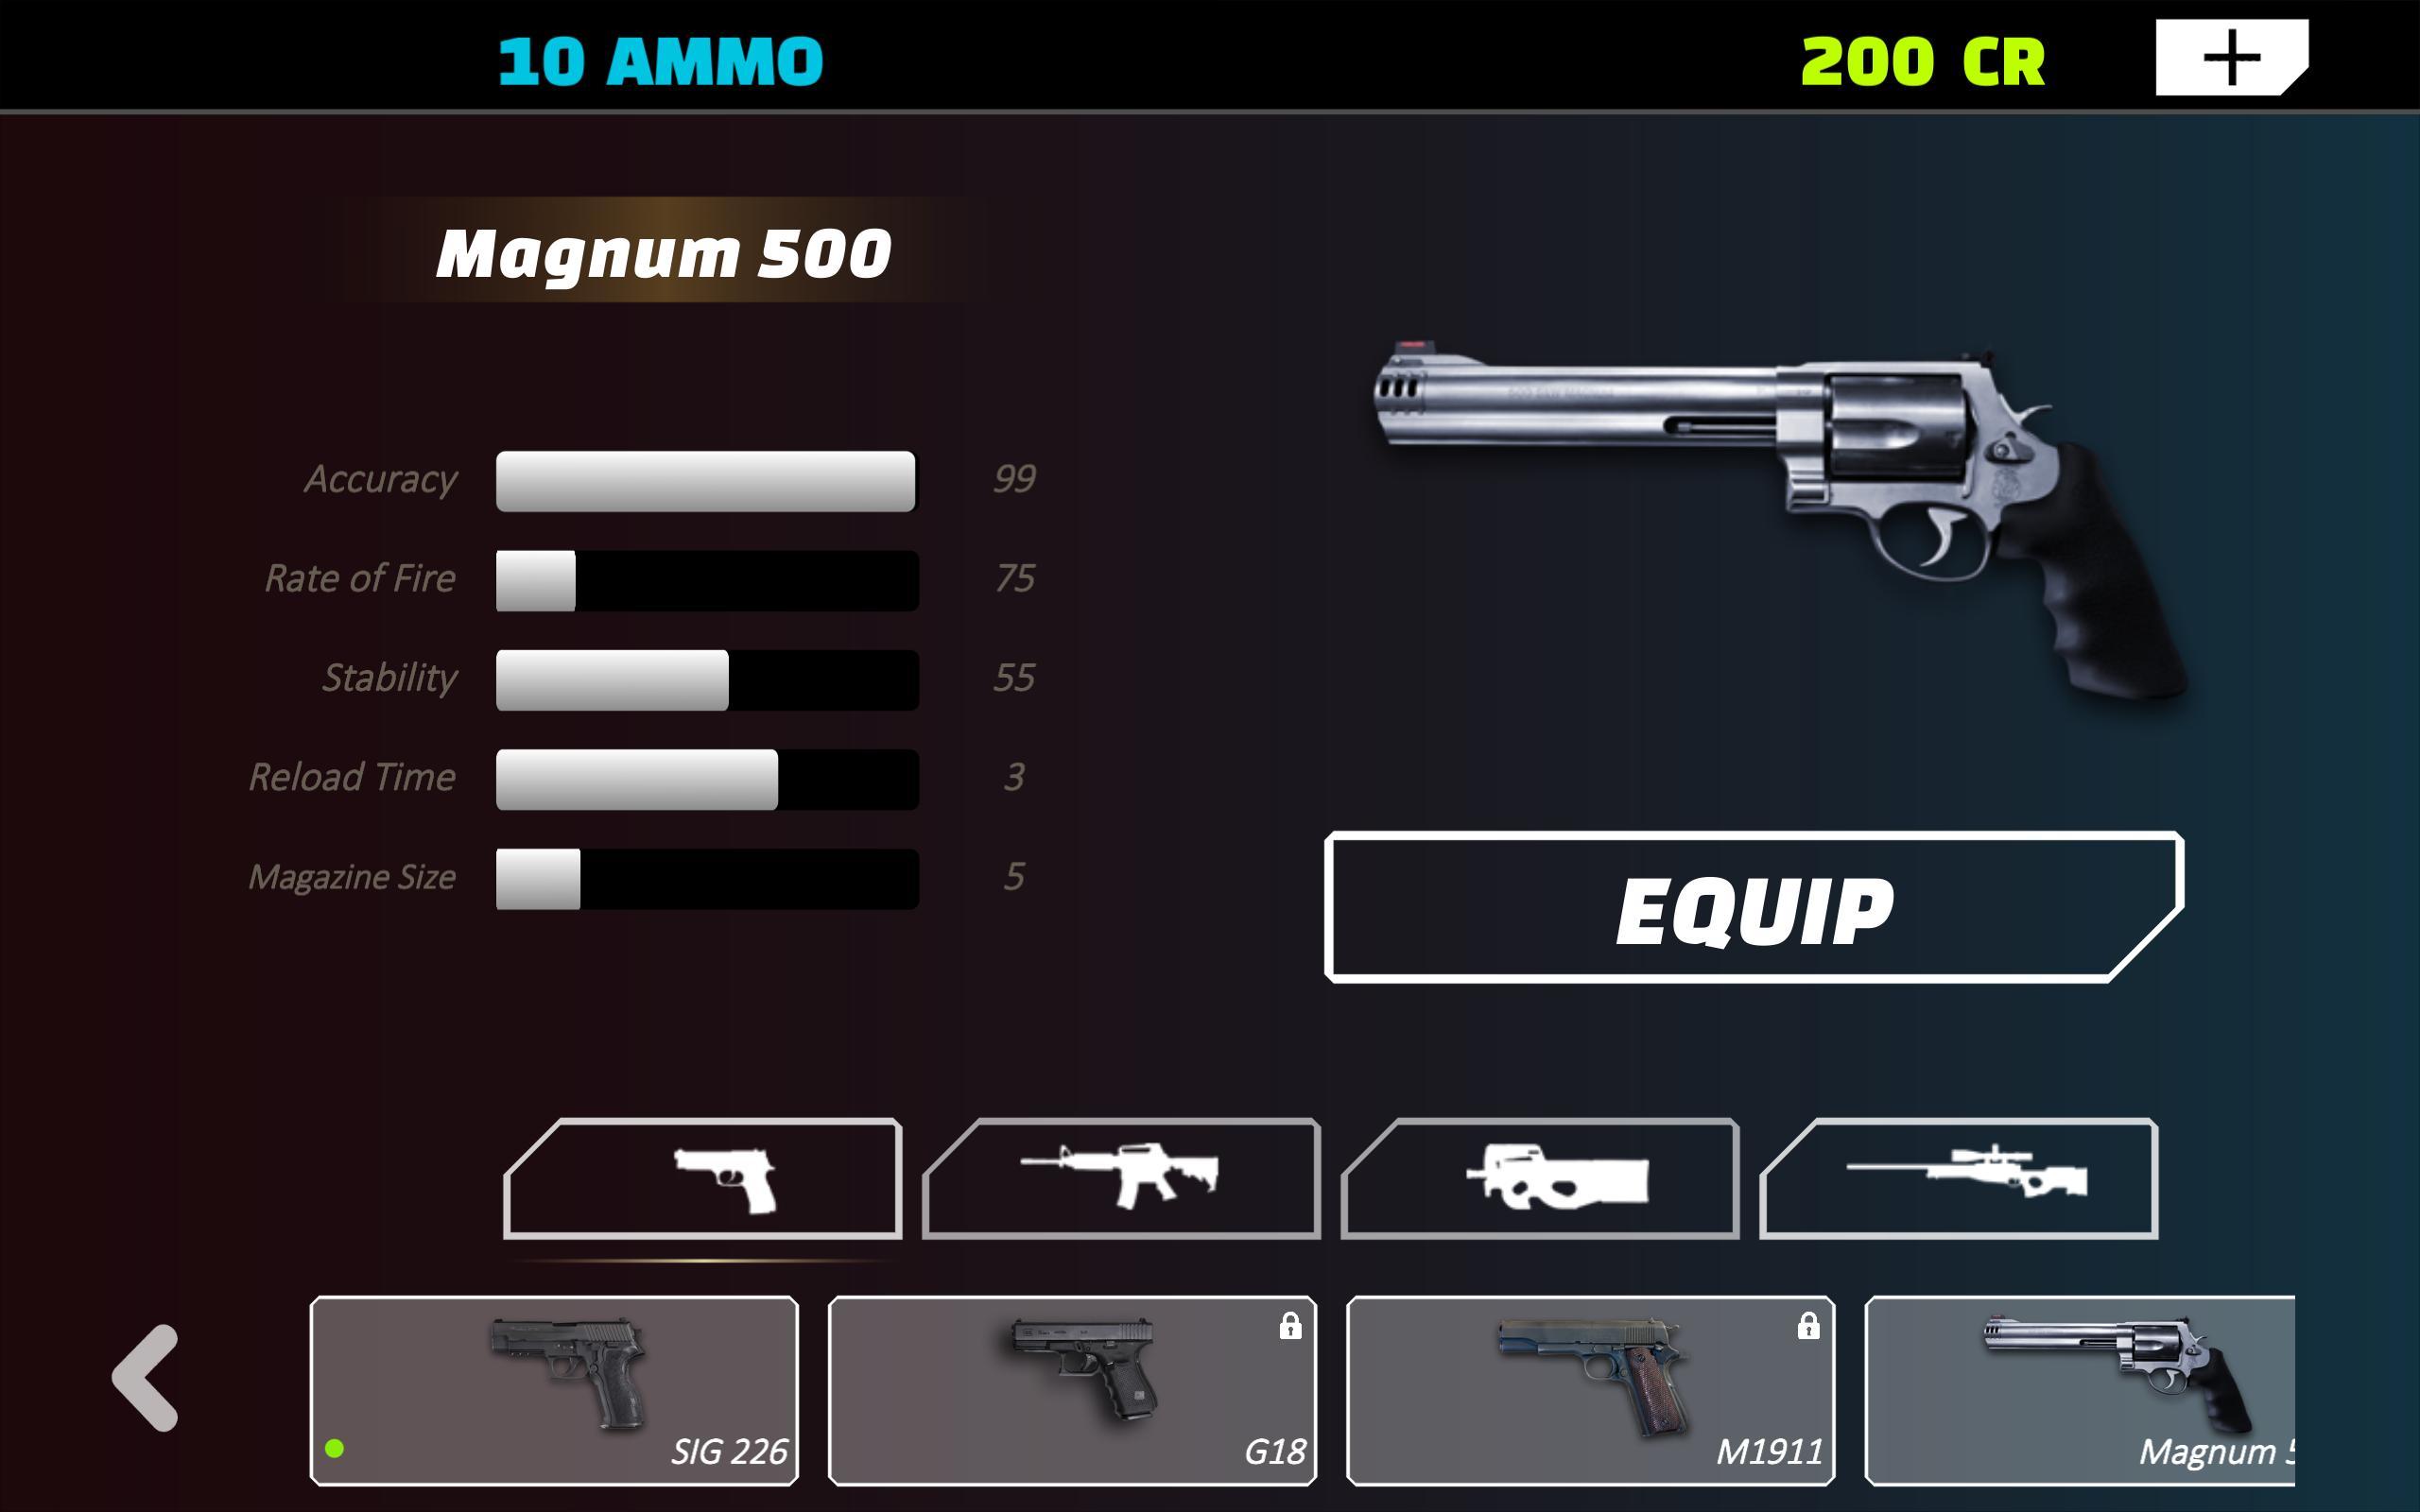 Canyon Shooting 2 - Free Shooting Range 3.0.6 Screenshot 10